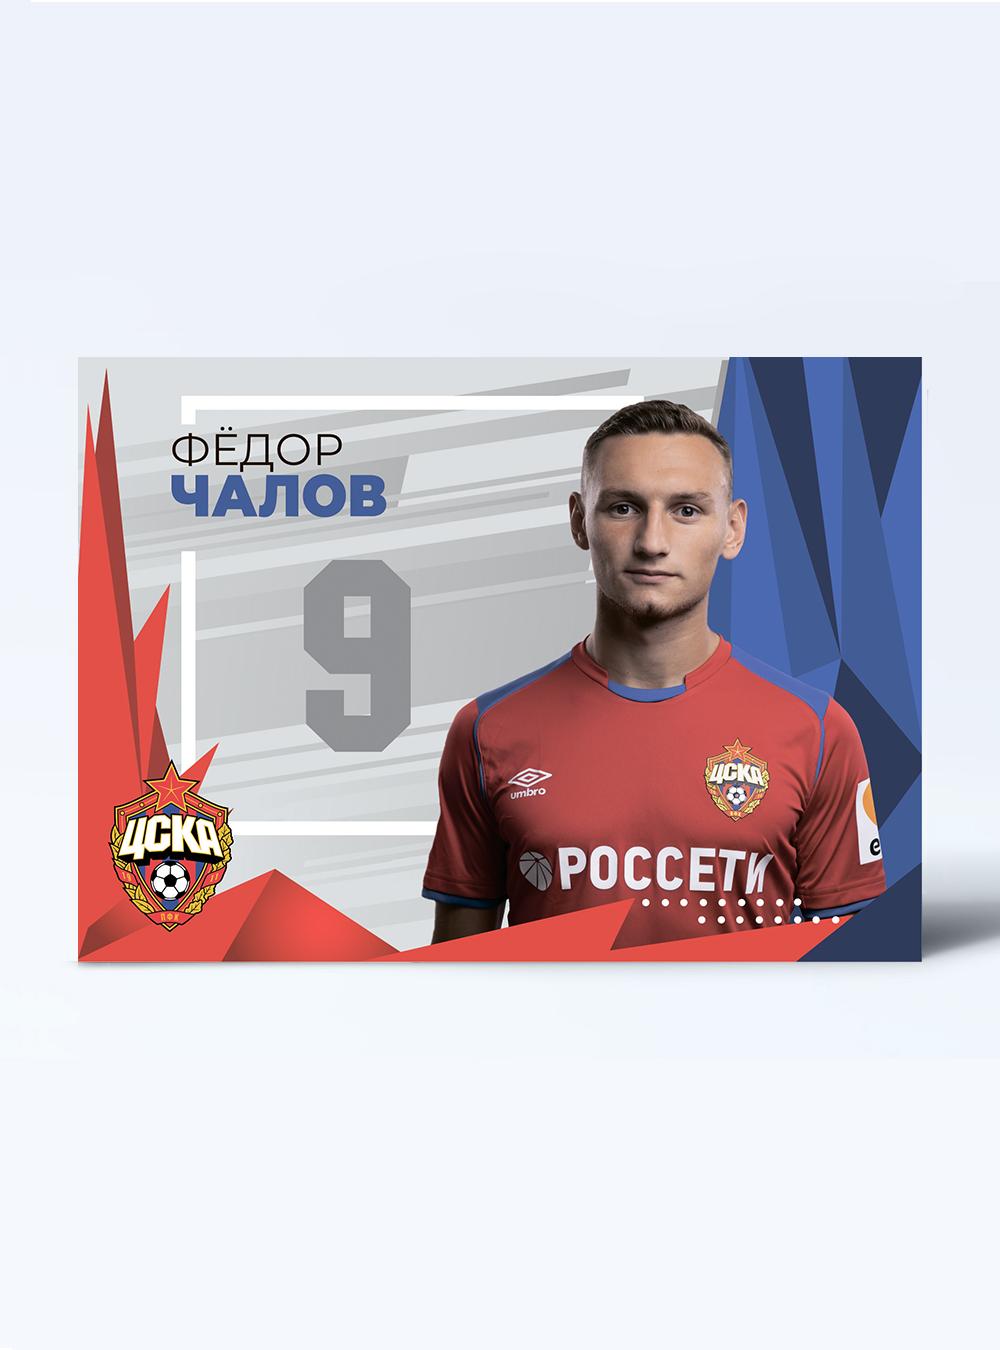 Карточка для автографа Чалов 2019/2020 фото